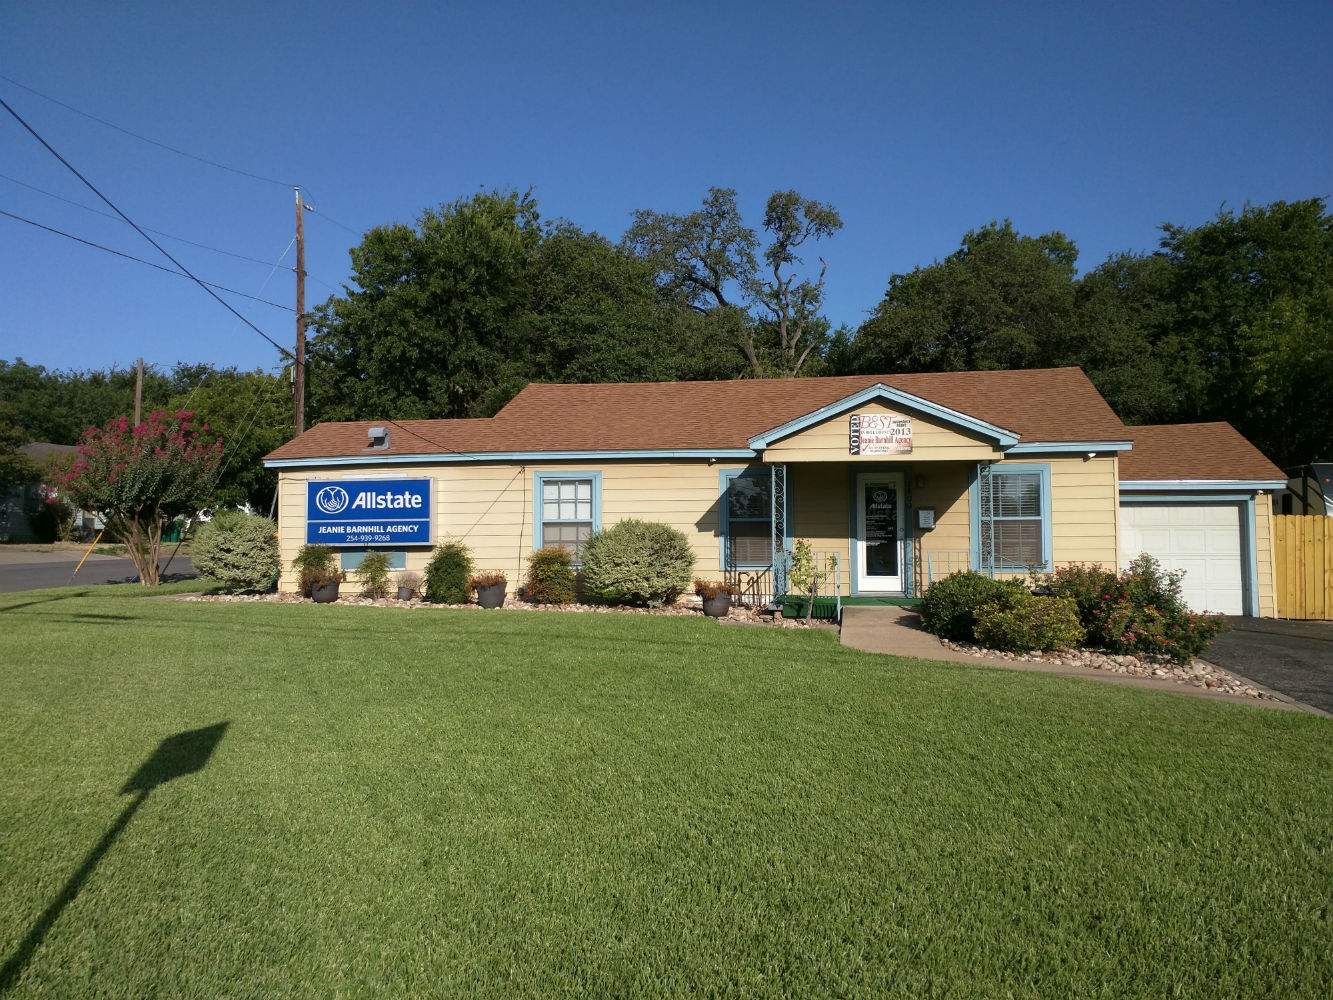 Allstate Insurance Agent: Jeanie Barnhill image 1